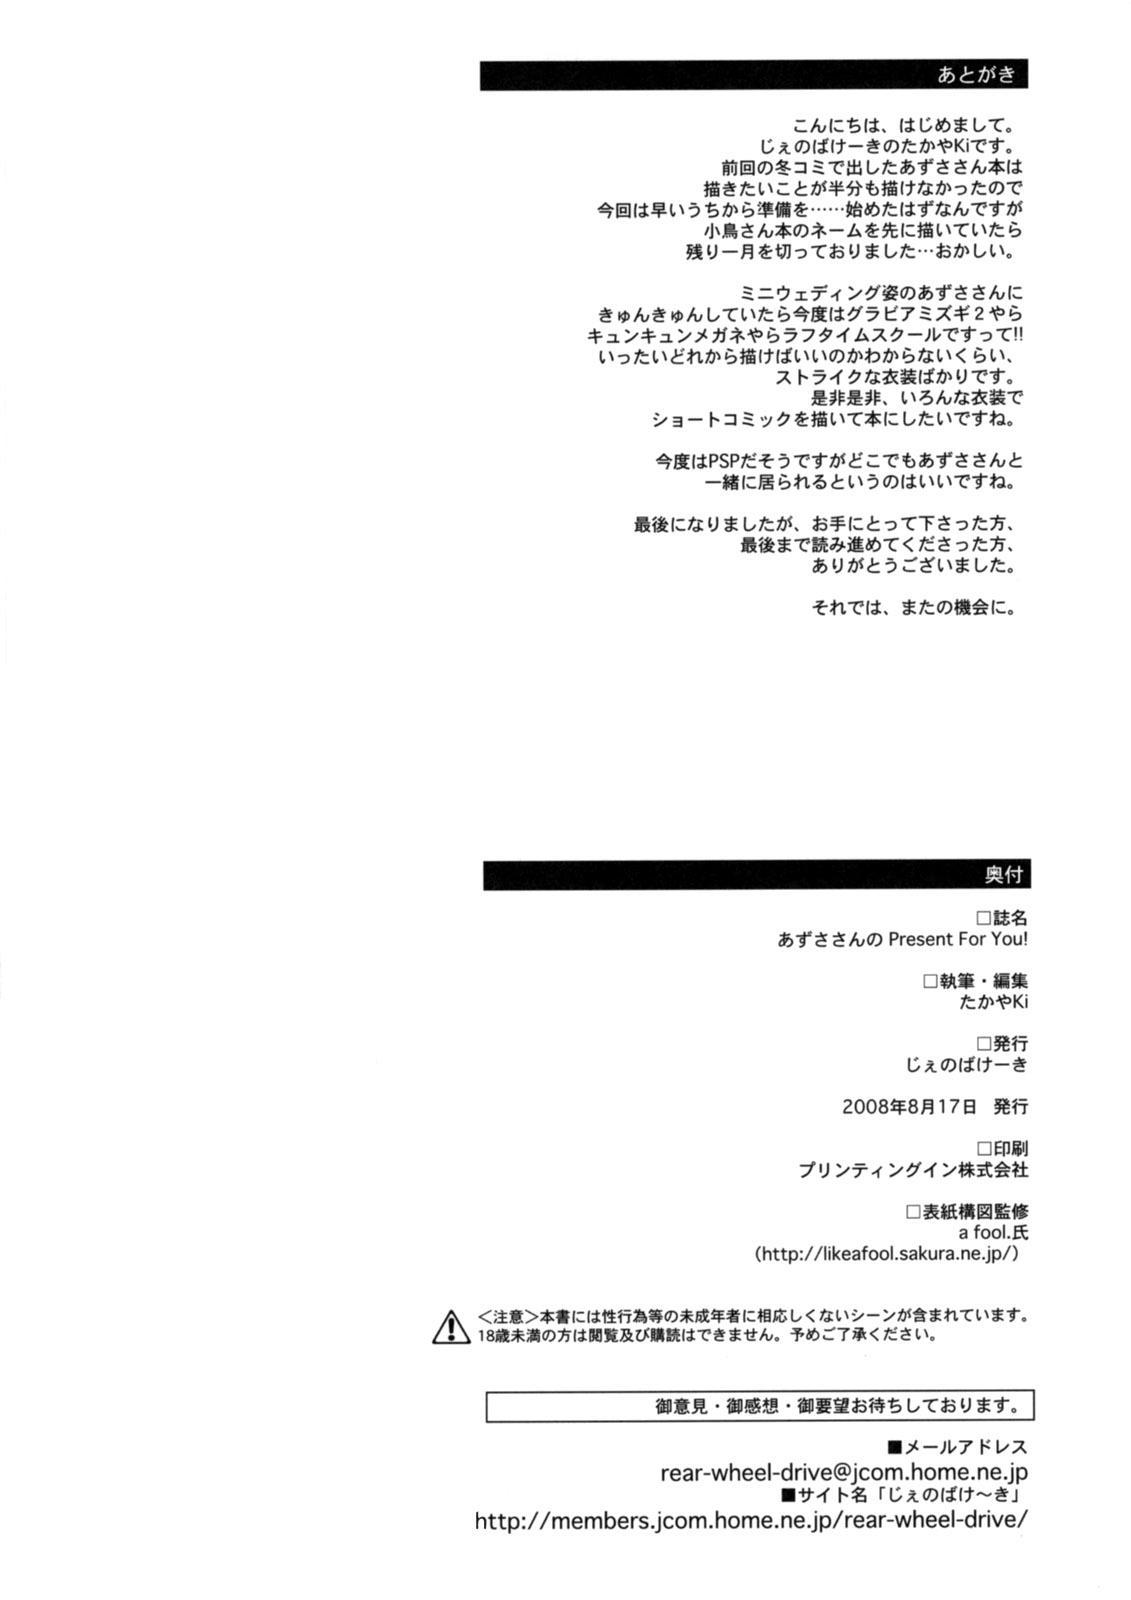 (C74) [Jenoa Cake (Takayaki)] Azusa-san no Present For you!   Azusa-san's Present For You! (THE iDOLM@STER) [English] 34